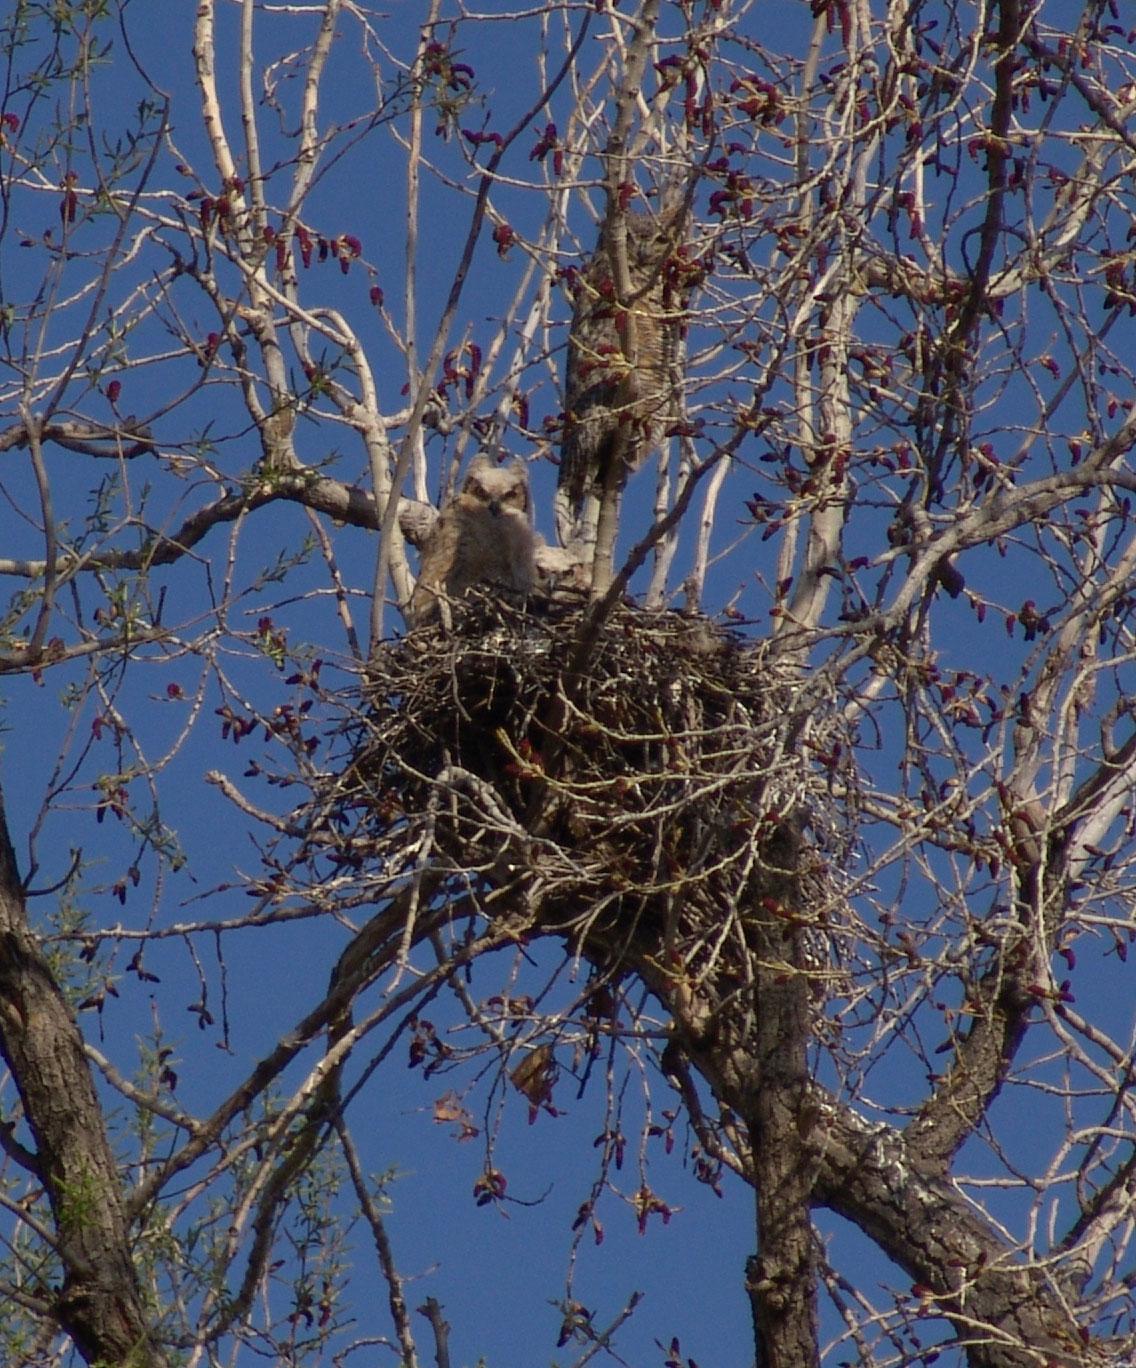 Owl Nest Owls Returned to The Nest